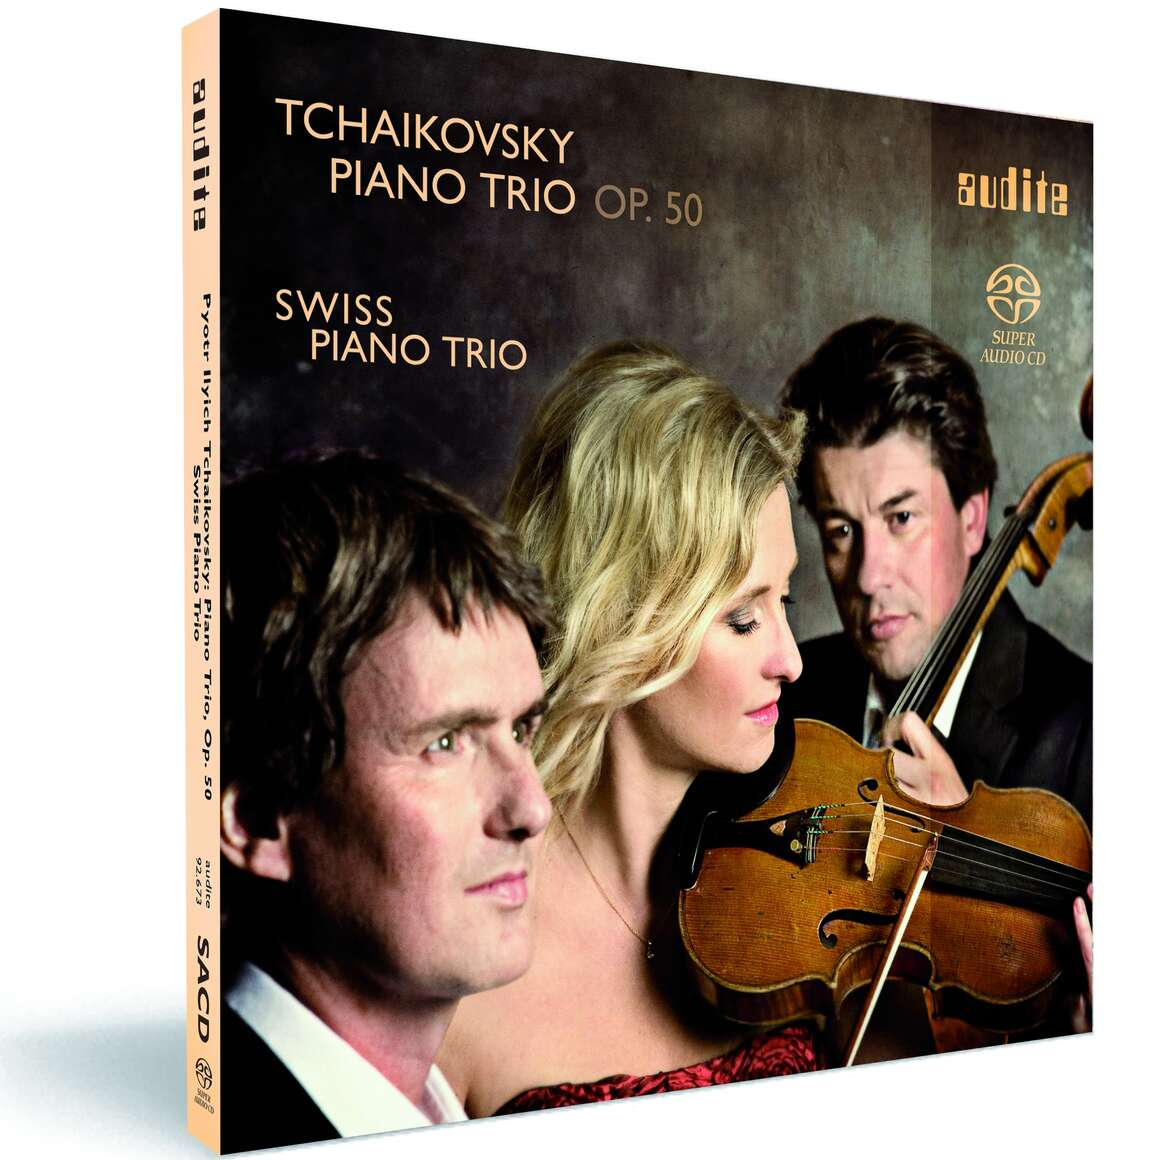 Peter Ilyich Tchaikovsky: Piano Trio, Op. 50